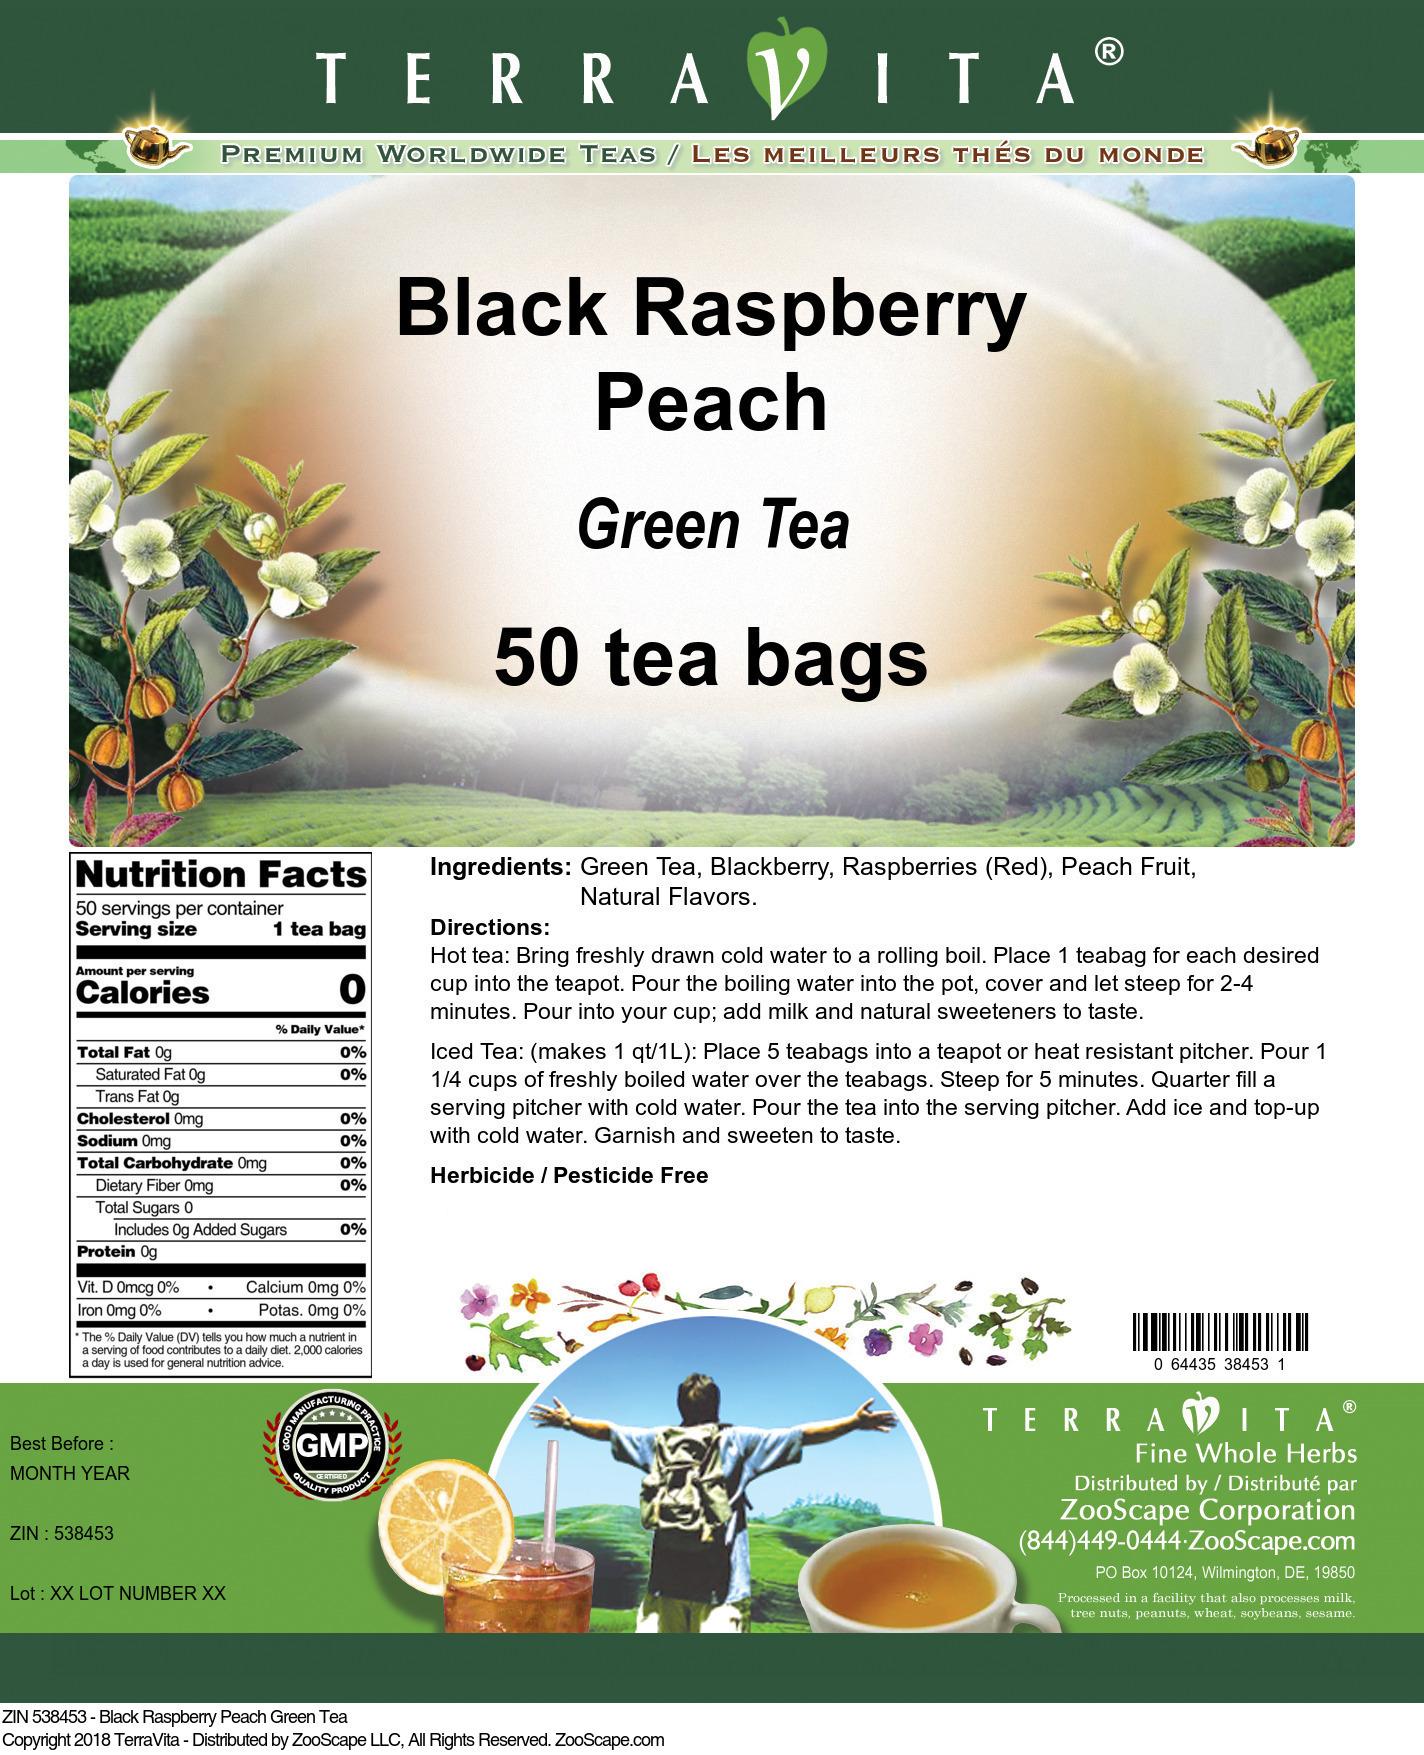 Black Raspberry Peach Green Tea